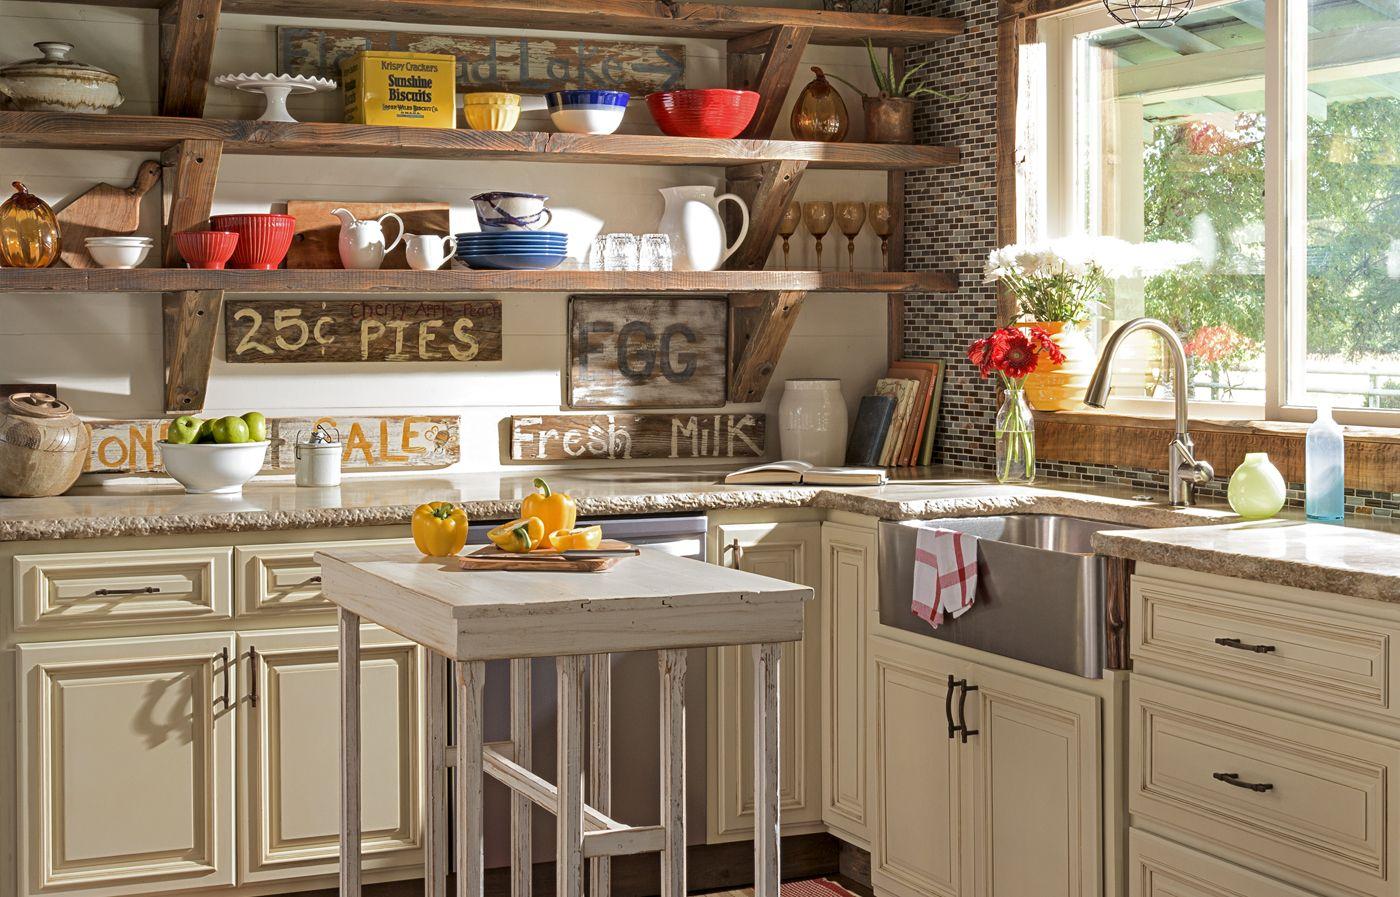 A True to Form 1929 Farmhouse | Rustic kitchen, Farmhouse ... on Rustic:yucvisfte_S= Farmhouse Kitchen Ideas  id=50057